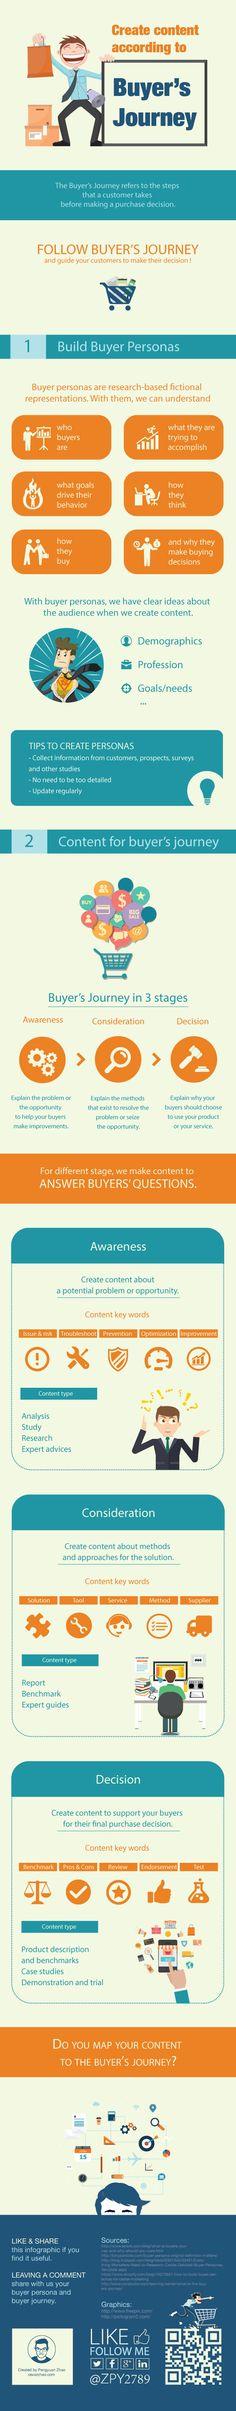 Create content according to Buyer's Journey